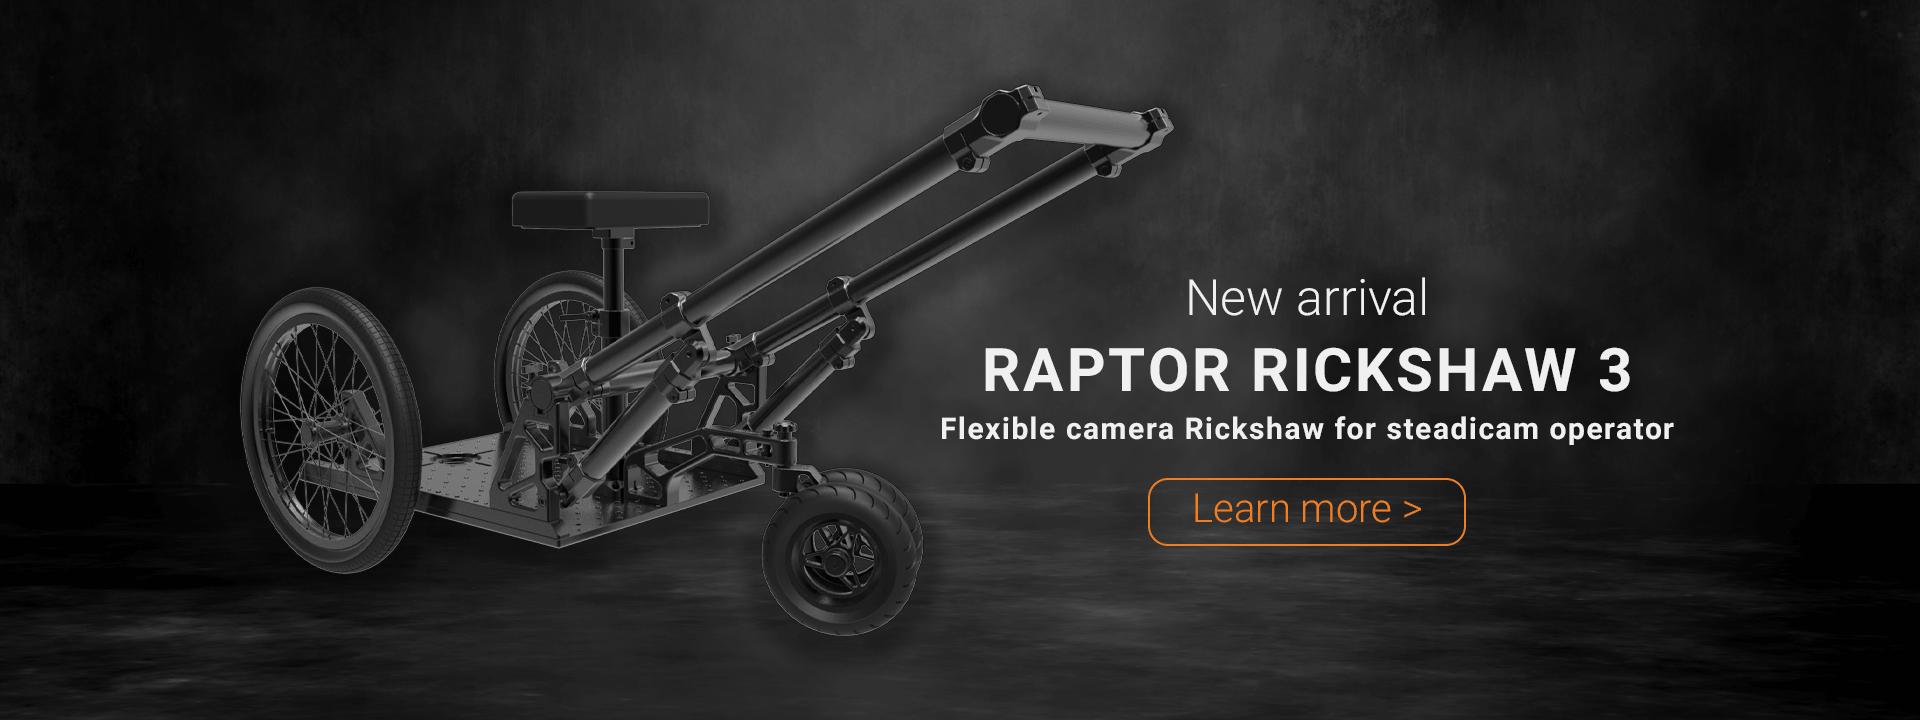 Raptor Rickshaw 3 - Flexible camera rickshaw for steadicam operators